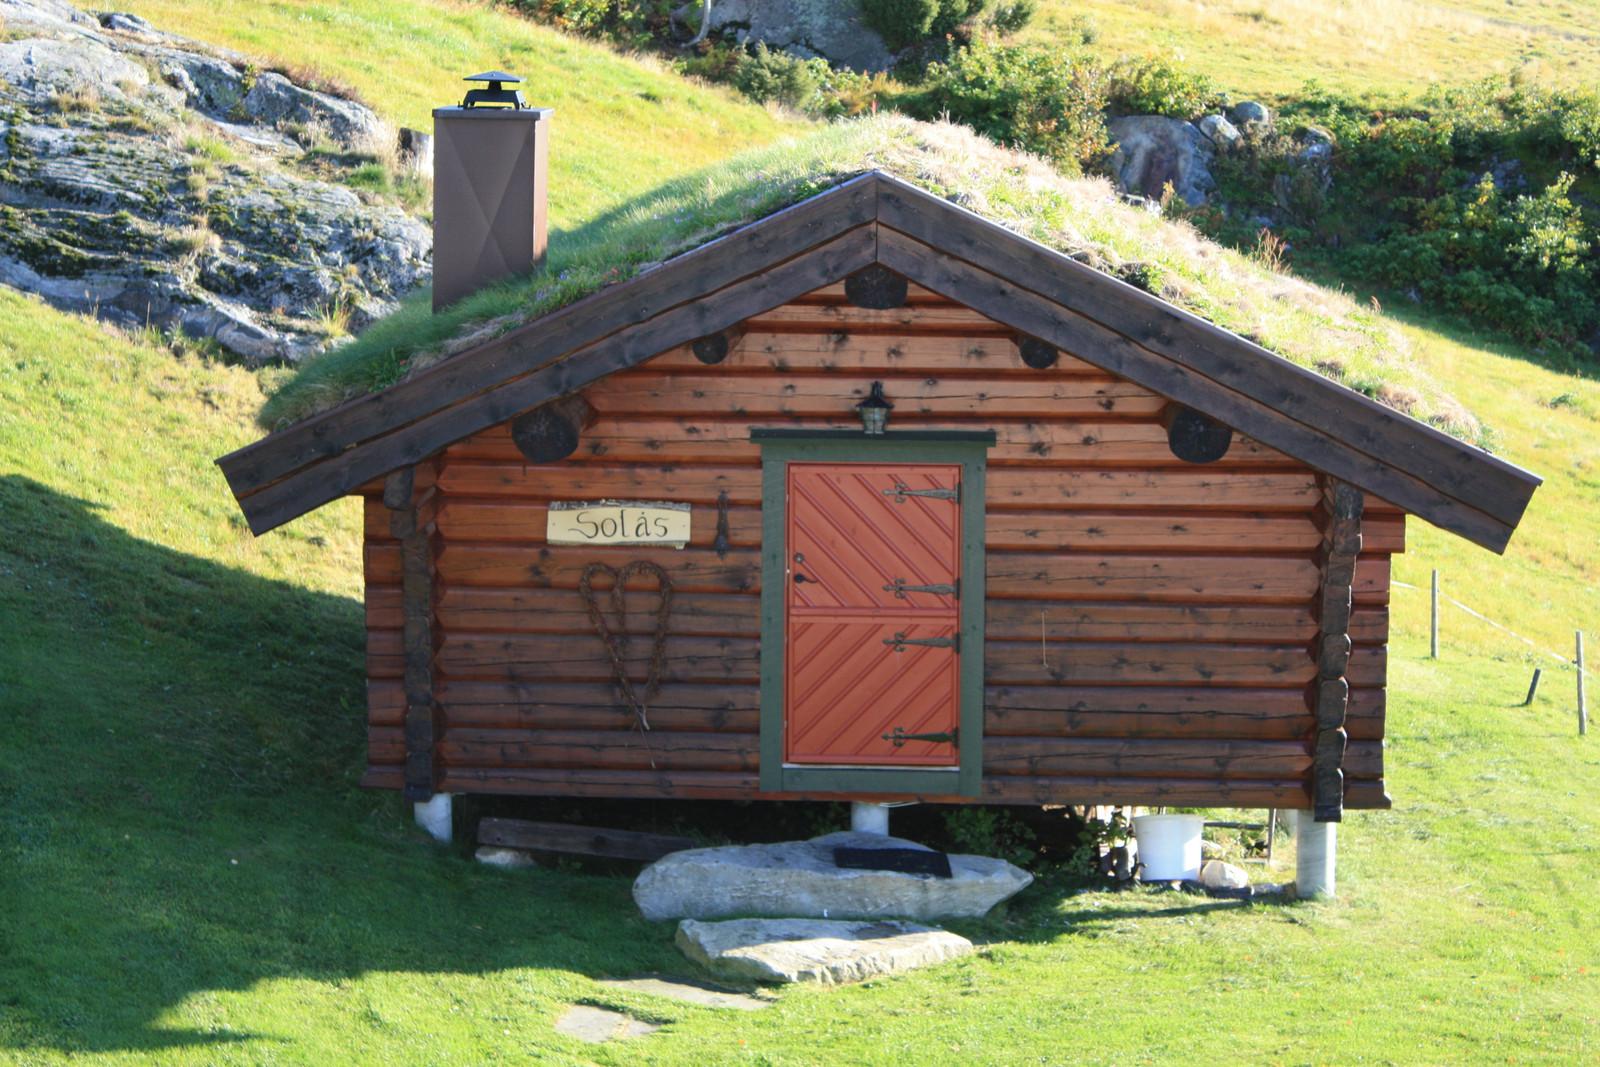 Tømmerhytta Solås